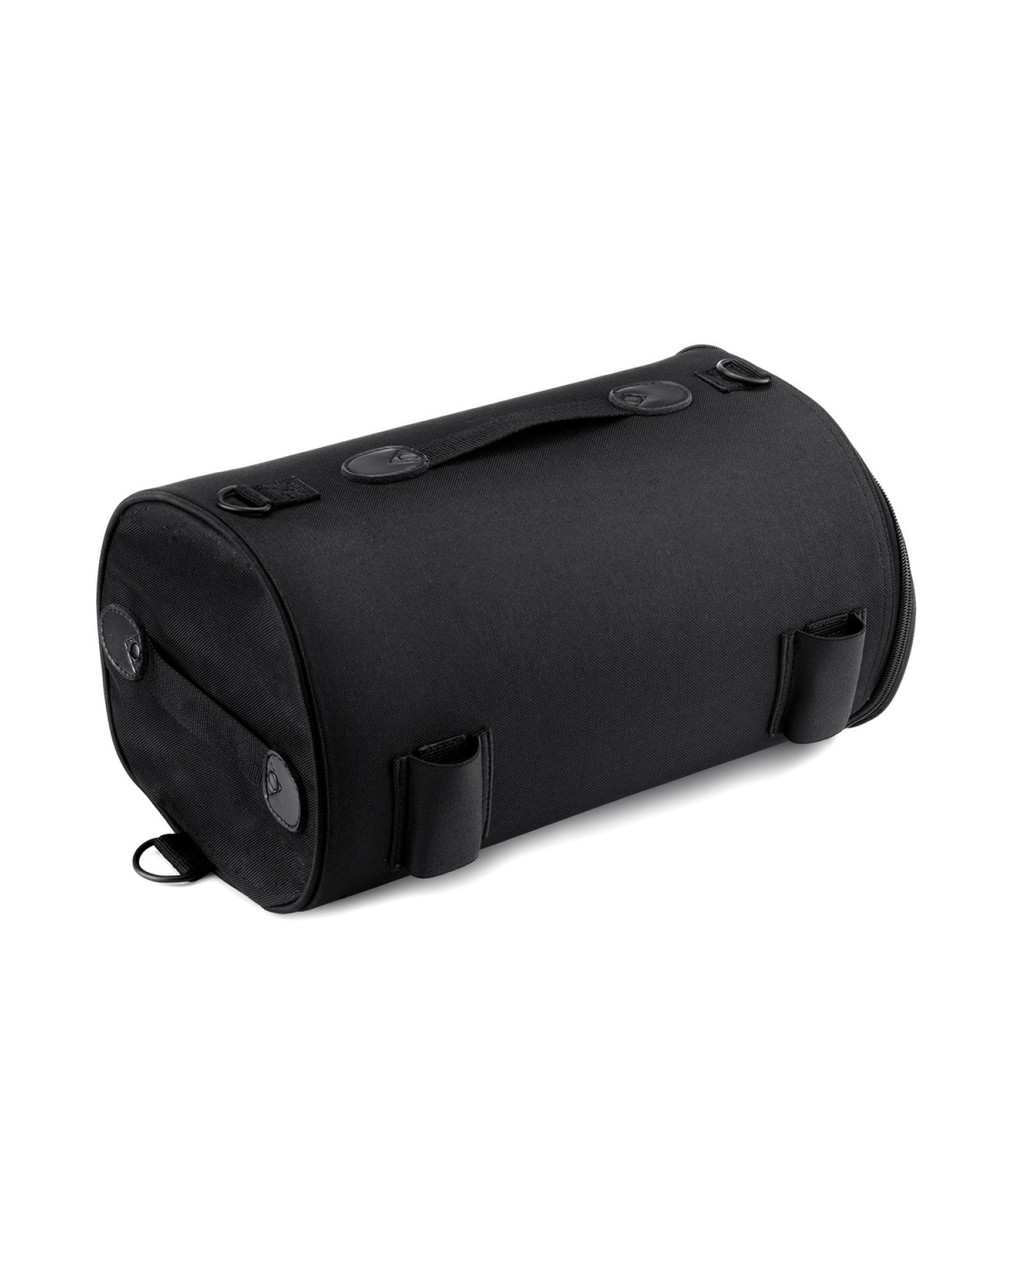 Harley Davidson Viking Extra Large Plain Motorcycle Sissy Bar Bag Roll Bag